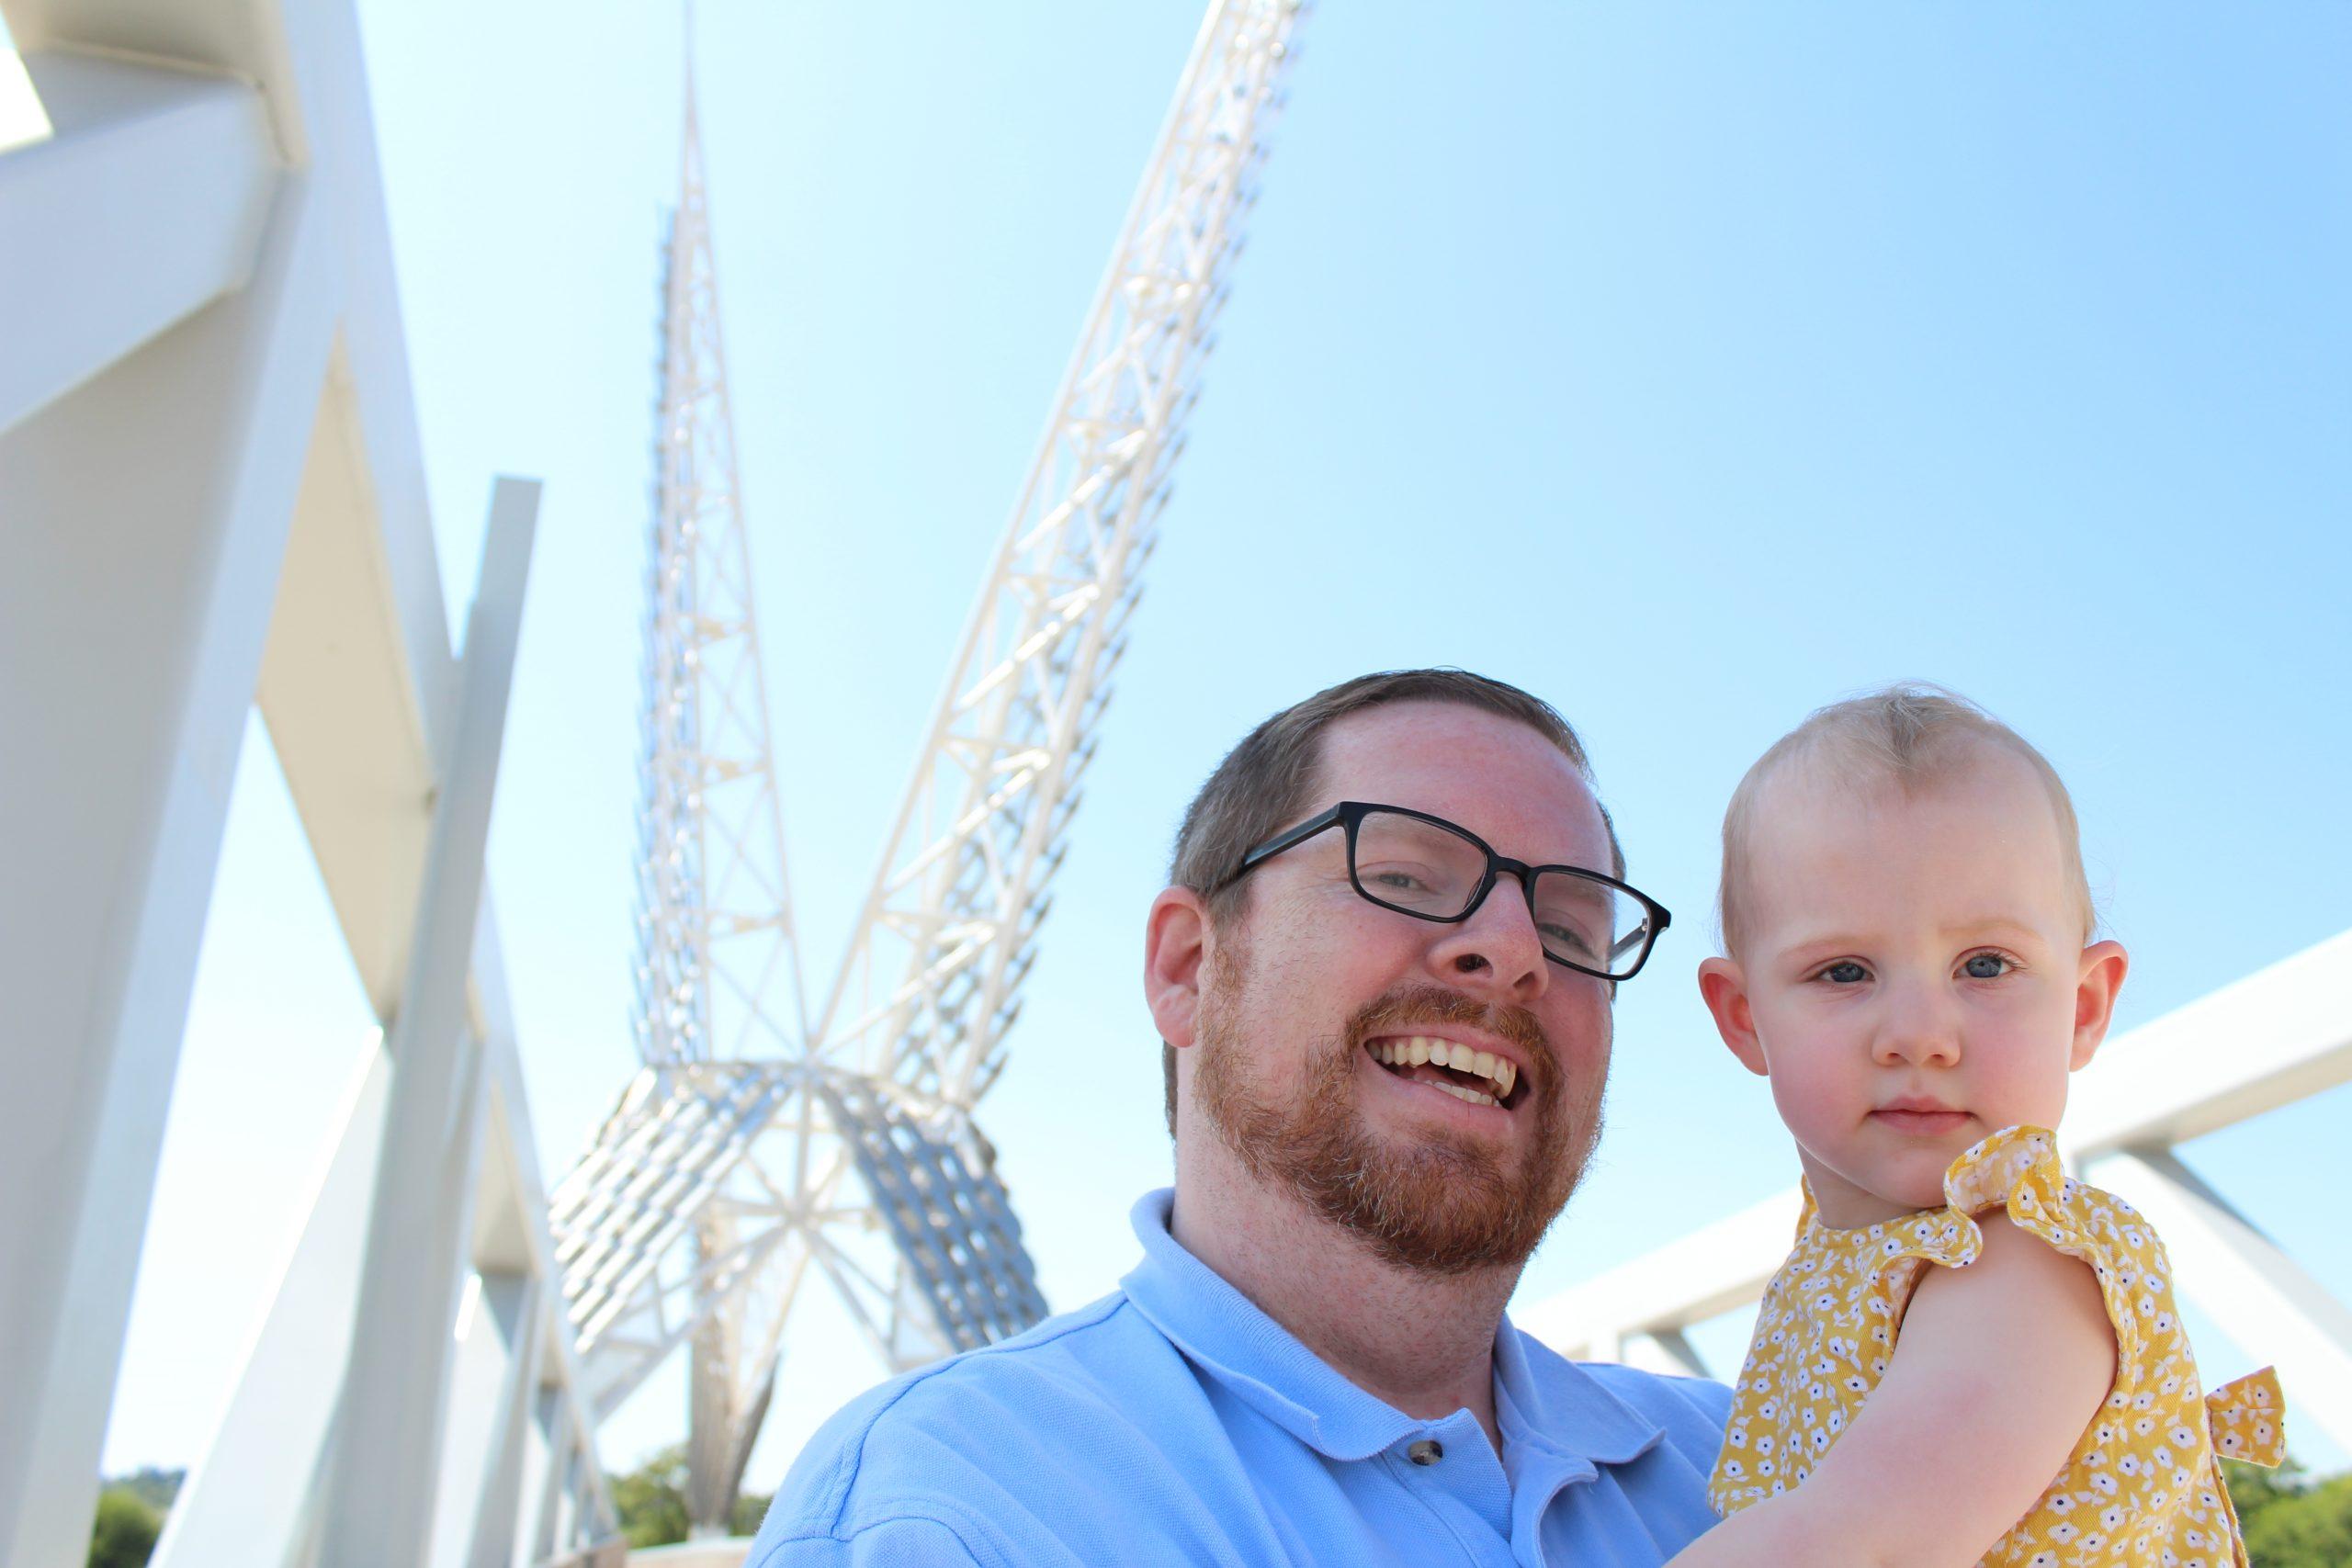 Best Family Photo Locations Around OKC - Skydance Bridge